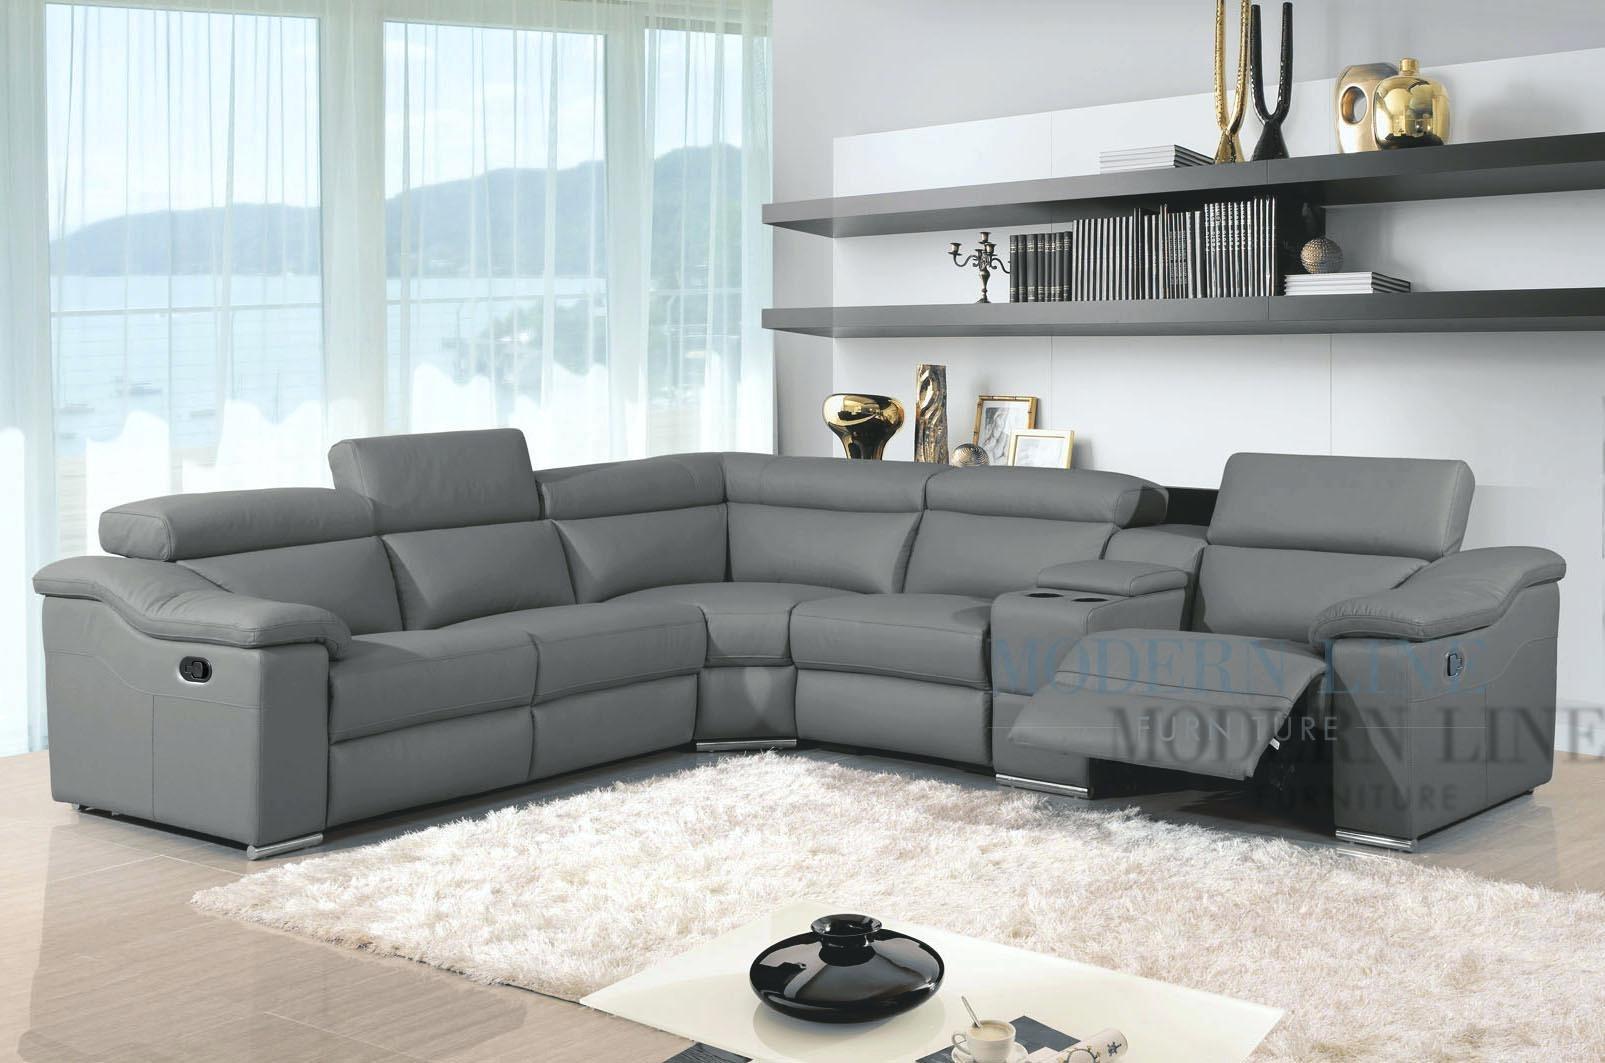 Leather Reclining Sectional Sofa – Kaaiz Inside Leather Recliner Sectional Sofas (Image 9 of 10)